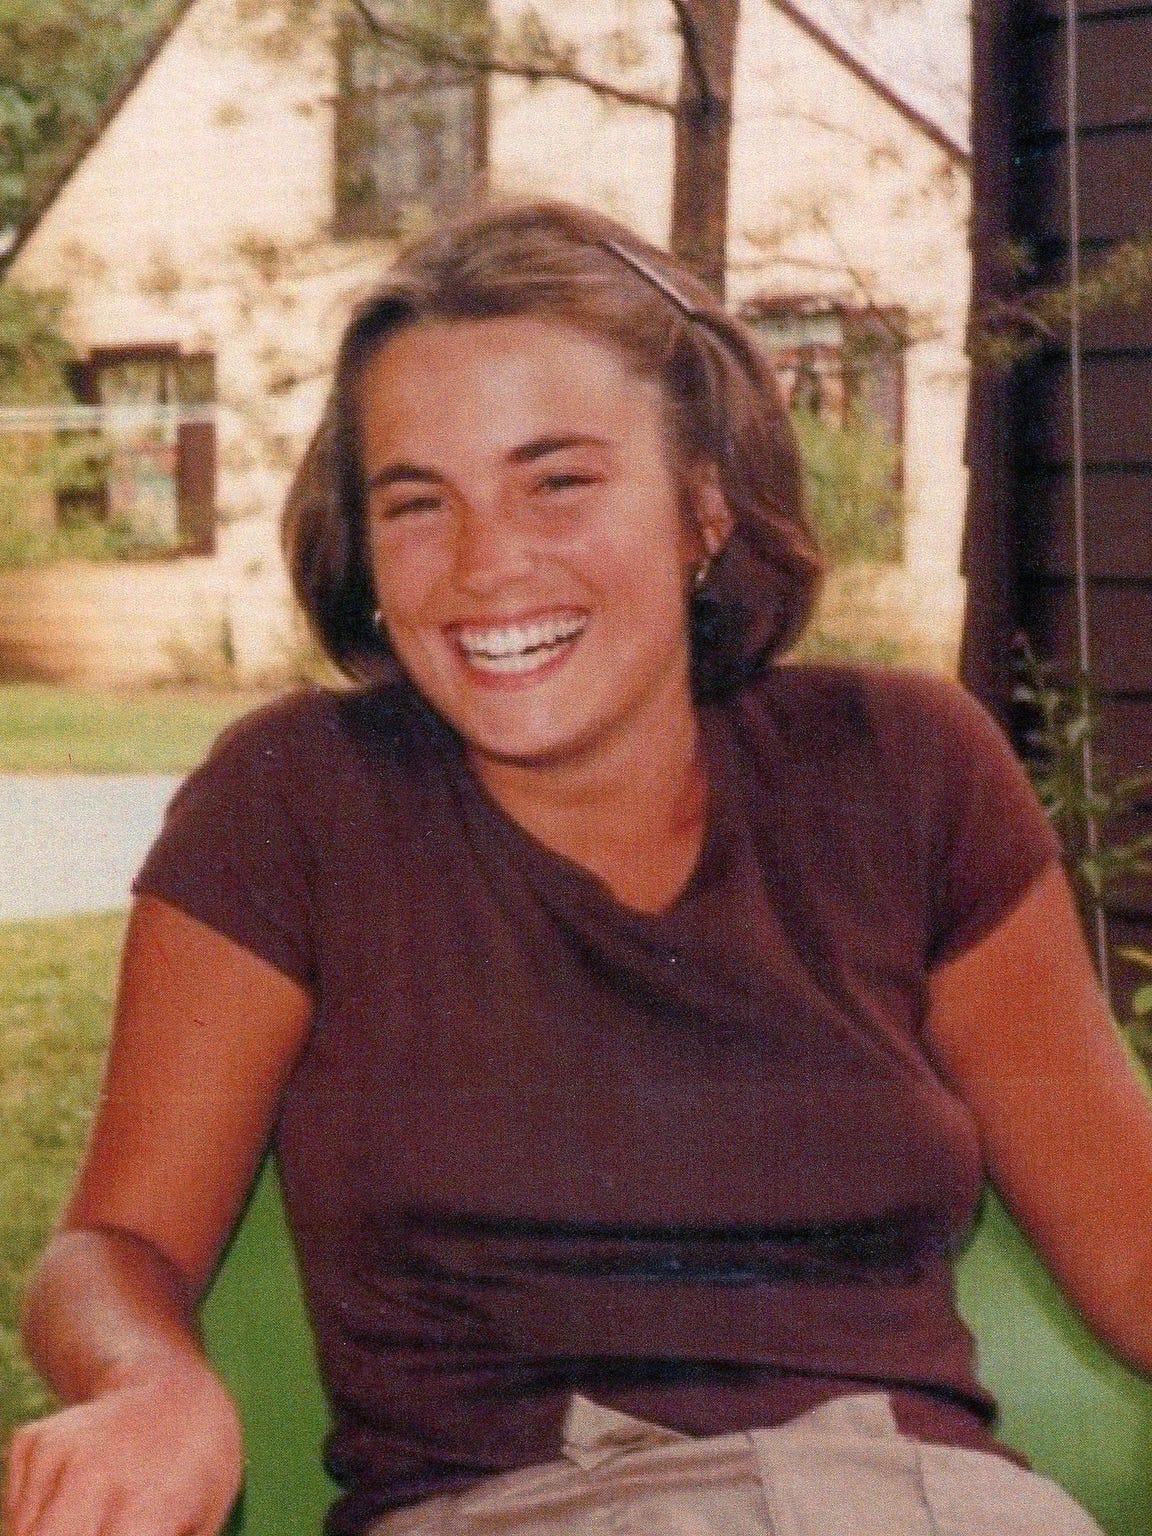 Elizabeth Andes' friends remember her easy-going smile,